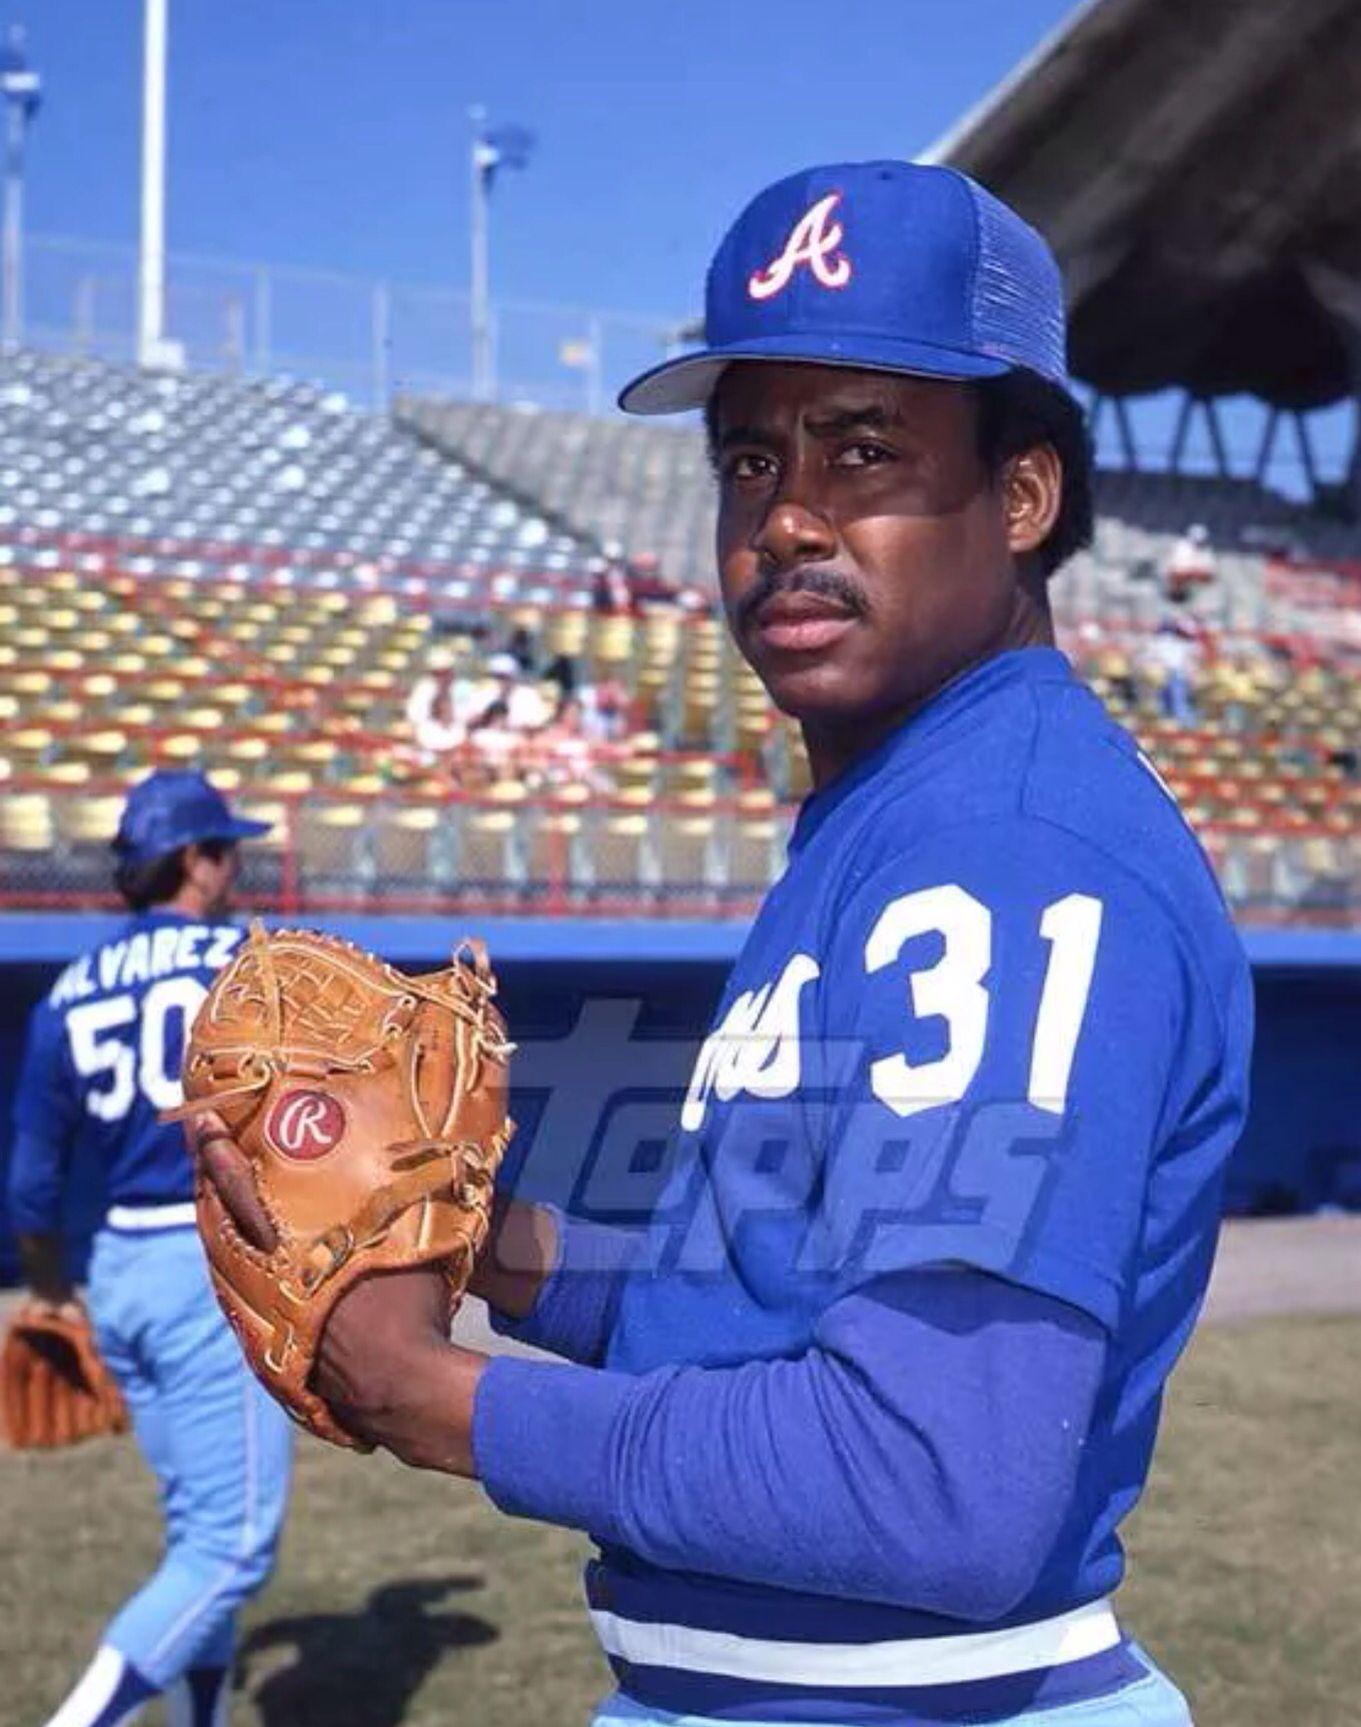 Donnie Moore Atlanta Braves Atlanta Braves Braves Major League Baseball